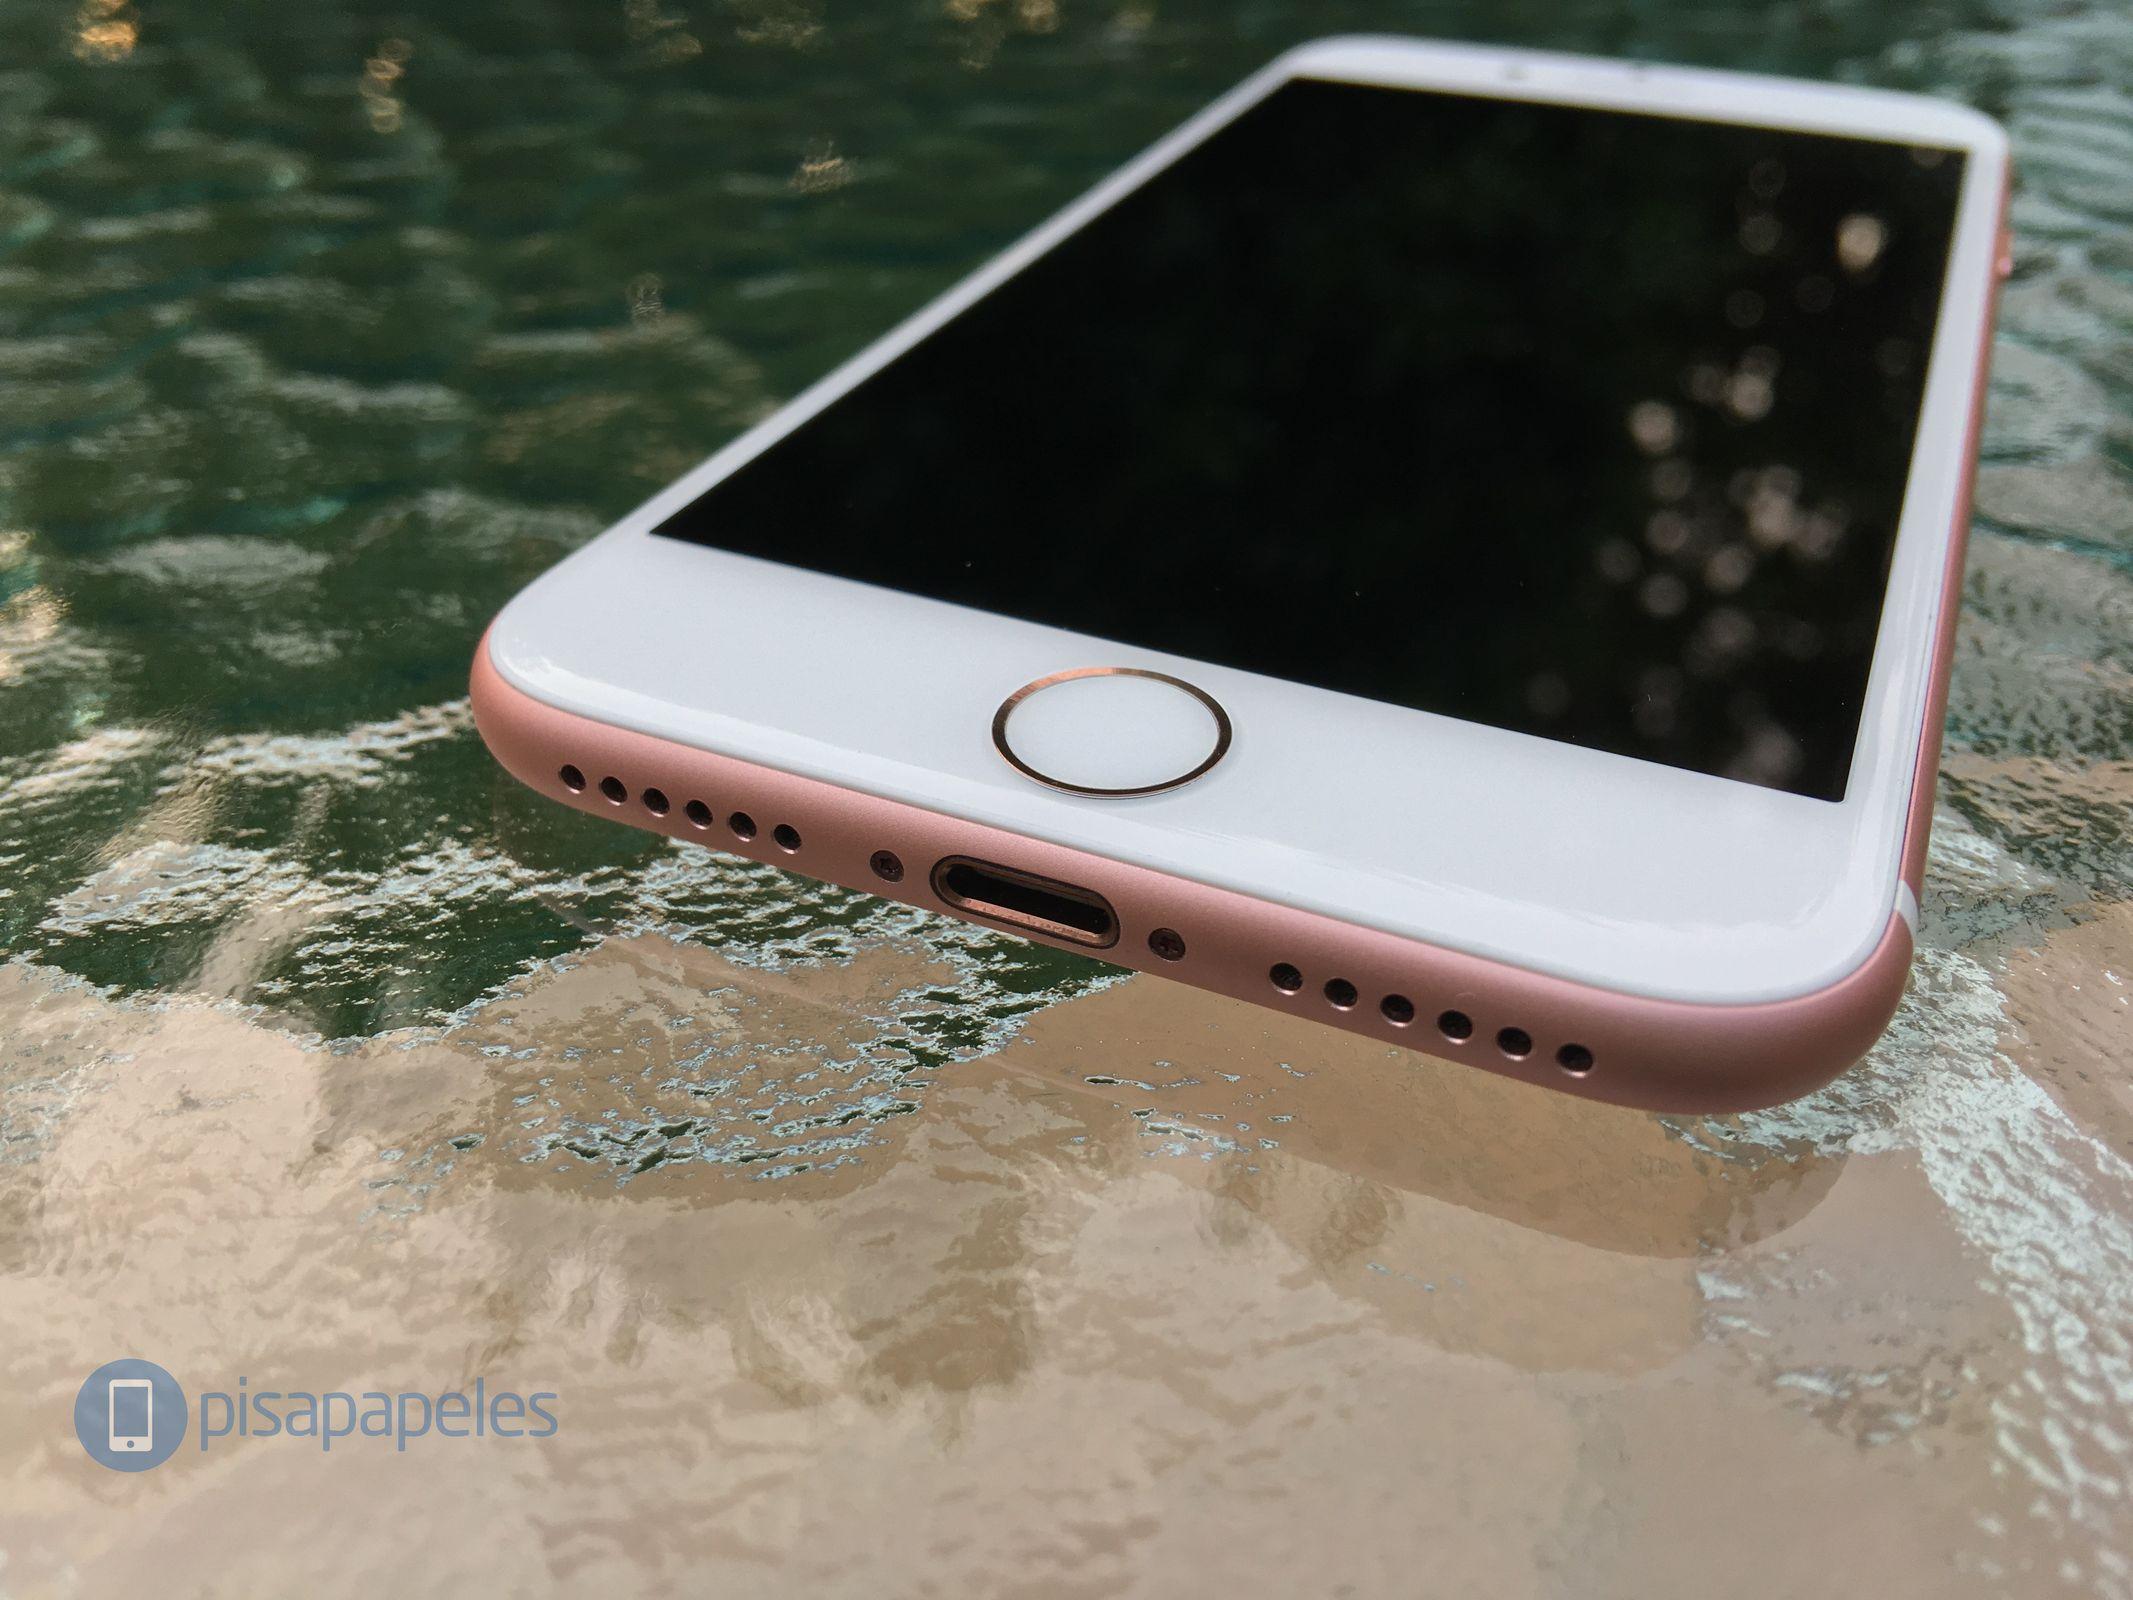 apple-iphone-7-pisapapeles-net_20